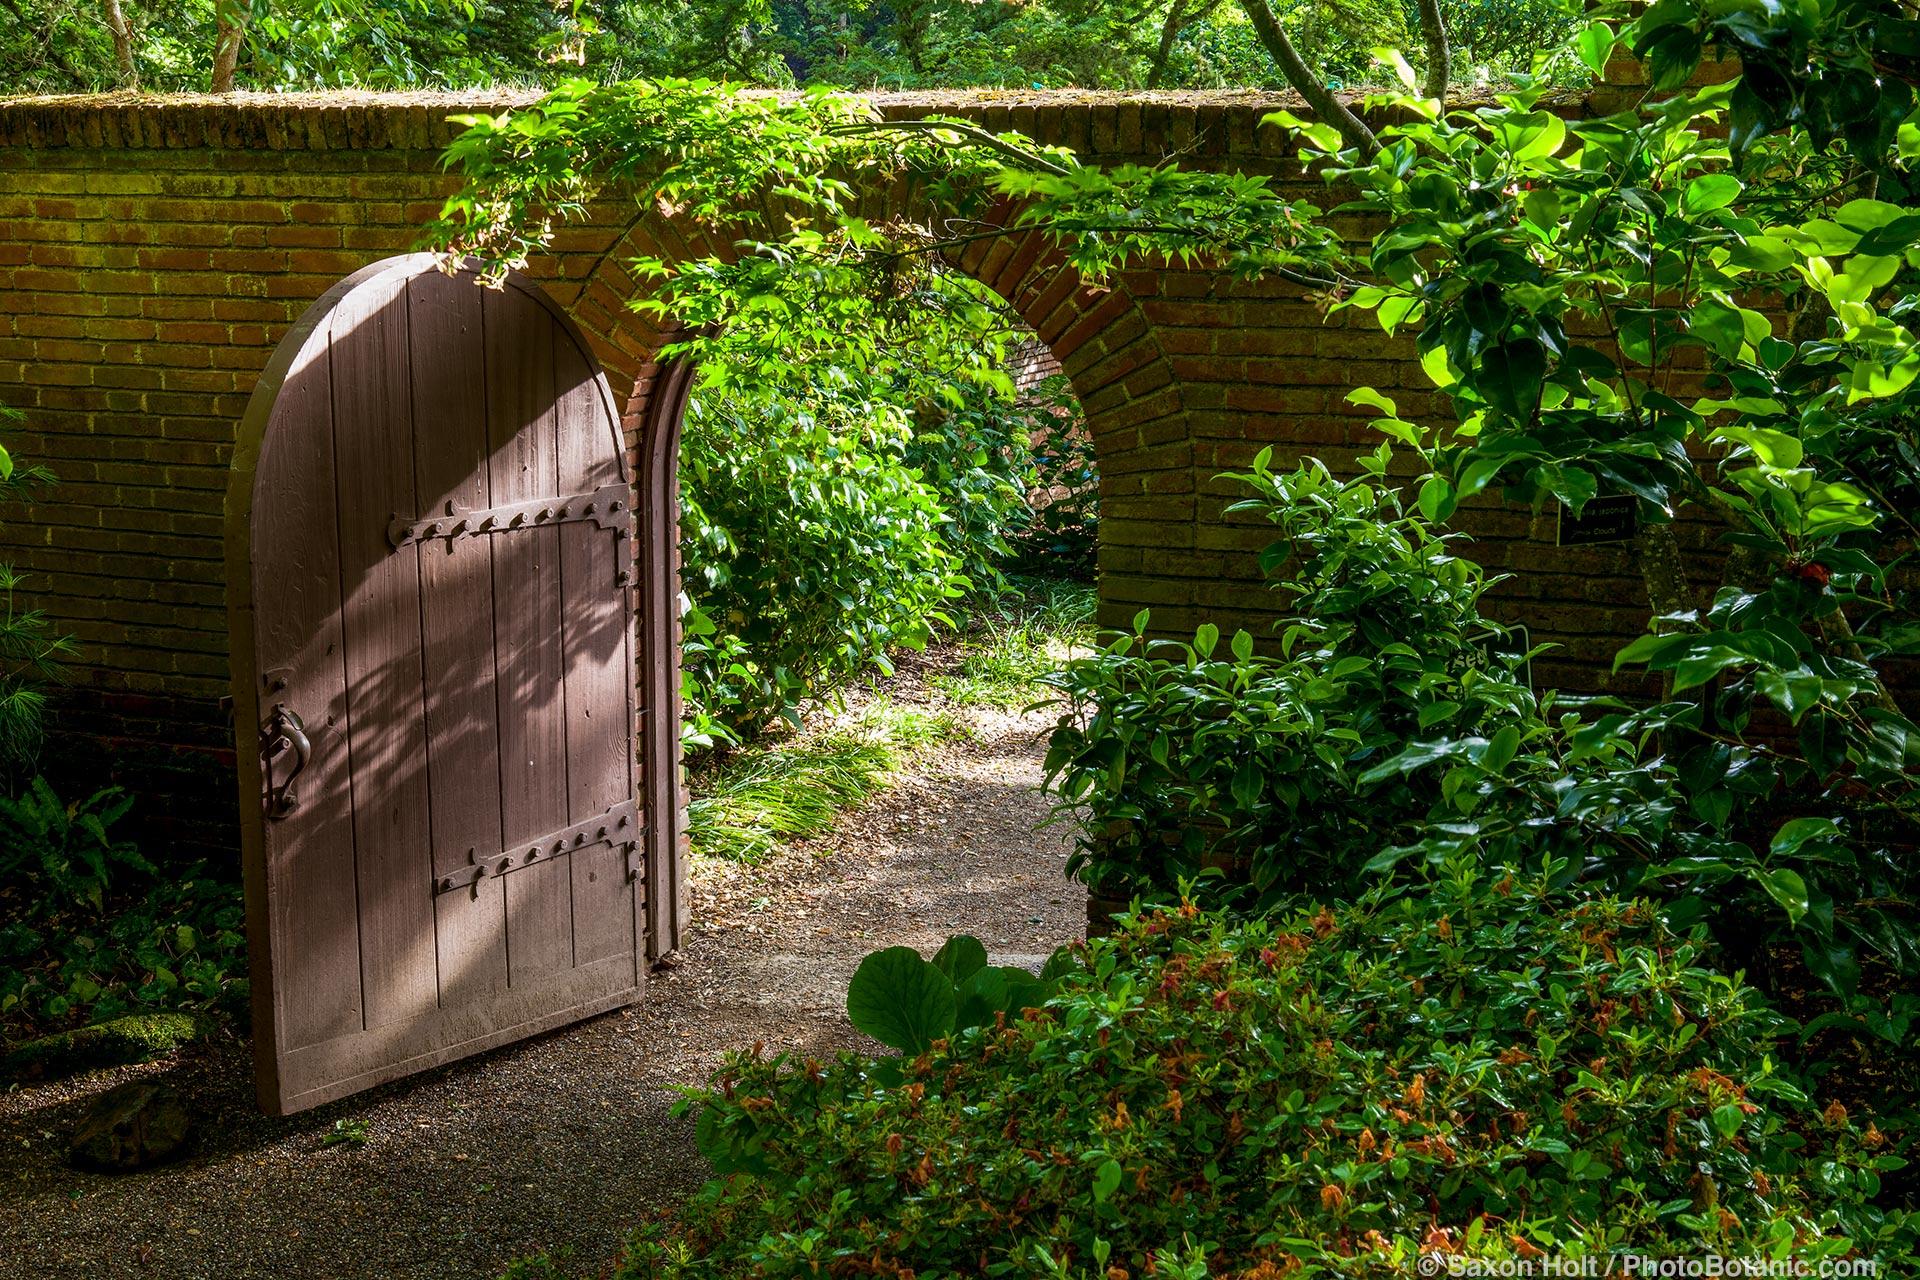 Wooden door in brick wall; open from woodland garden to garden beyond at Filoli